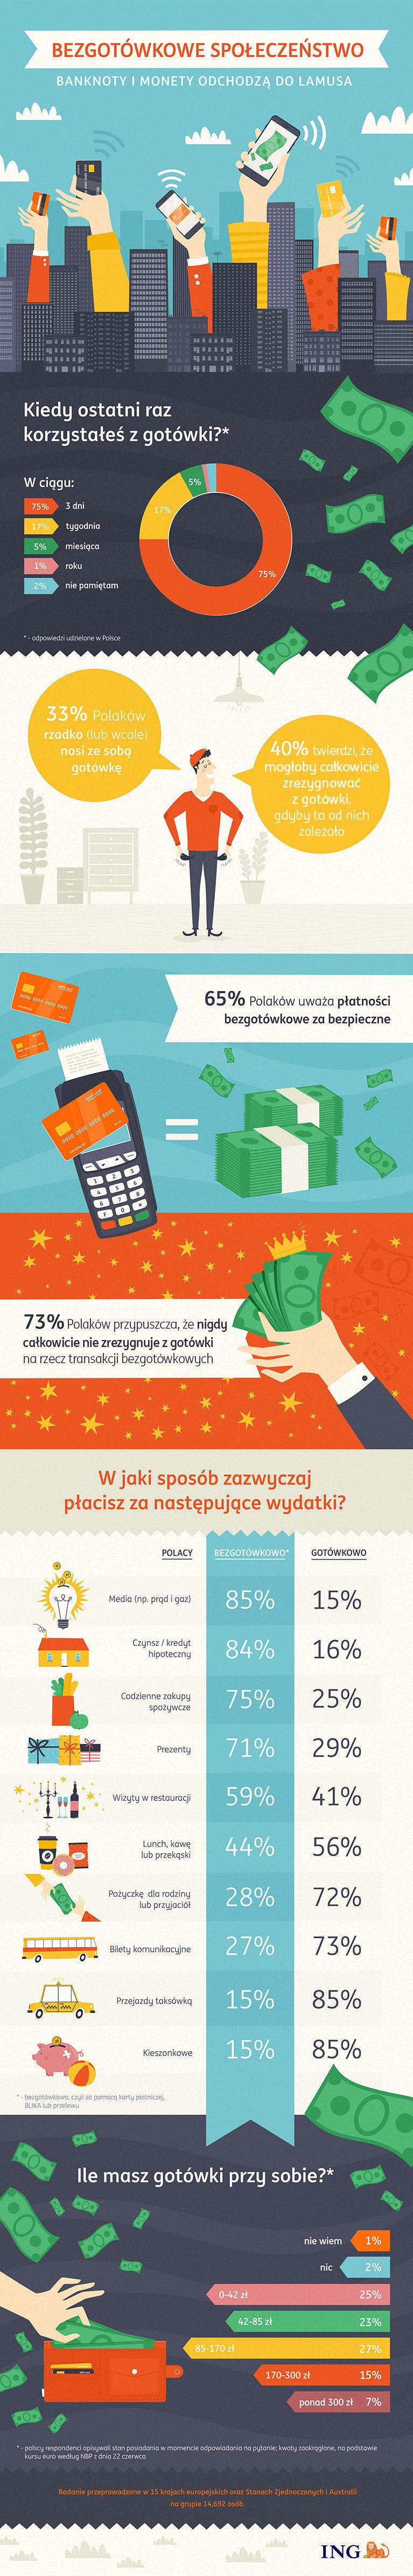 ING Bank Śląski - infografika.